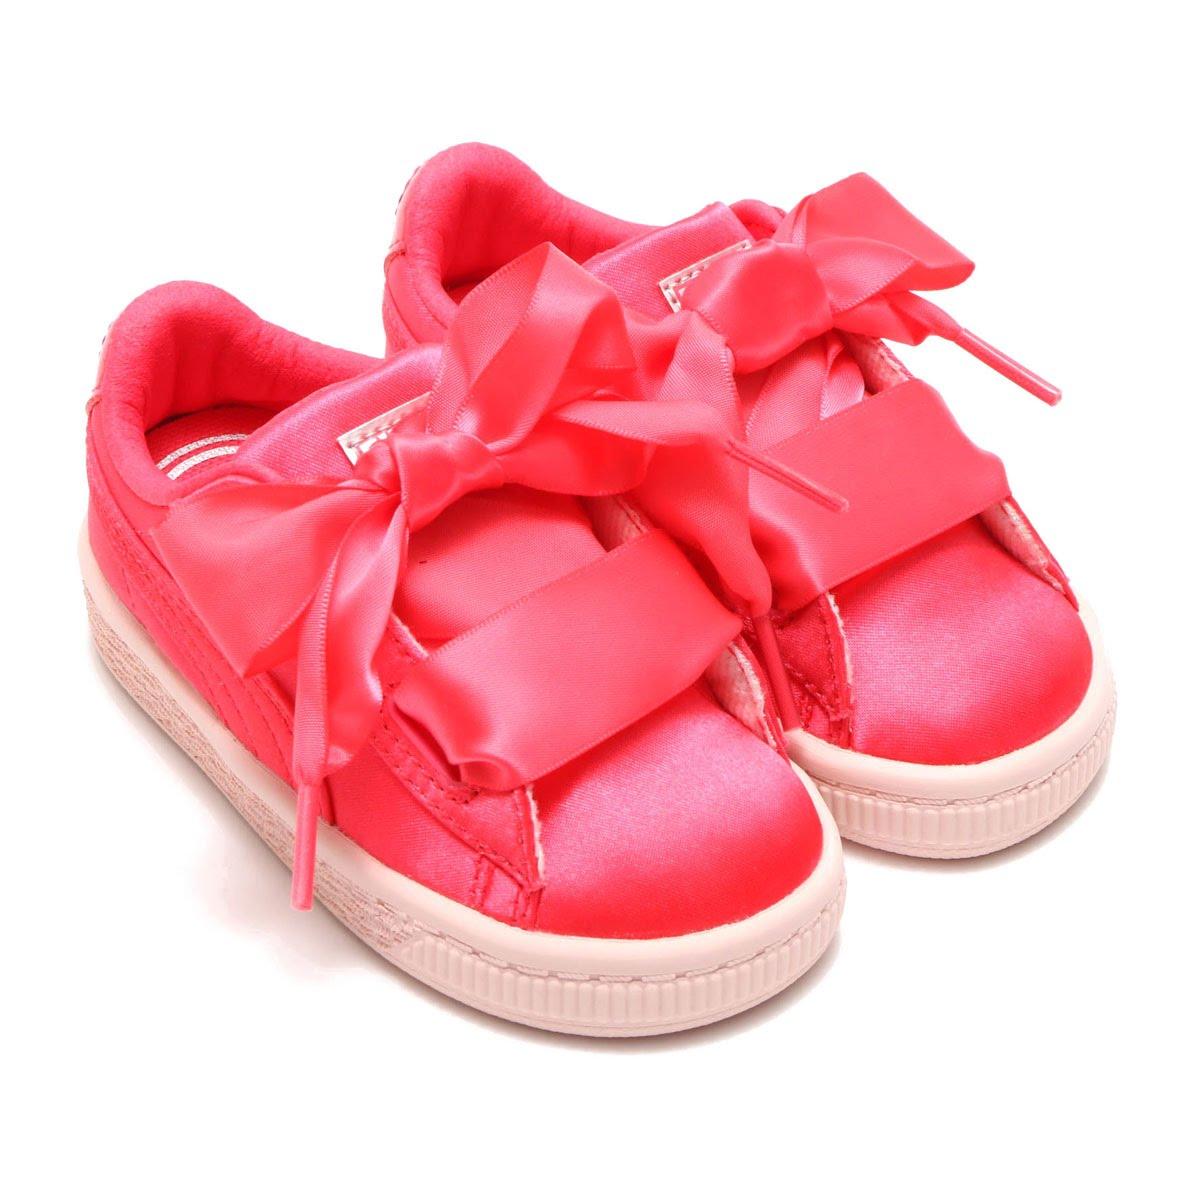 sports shoes 83a21 c56f3 PUMA BASKET HEART TWEEN INFANT (プーマバスケットハートトゥイーンインファント) PARADISE PINK 18SP-I